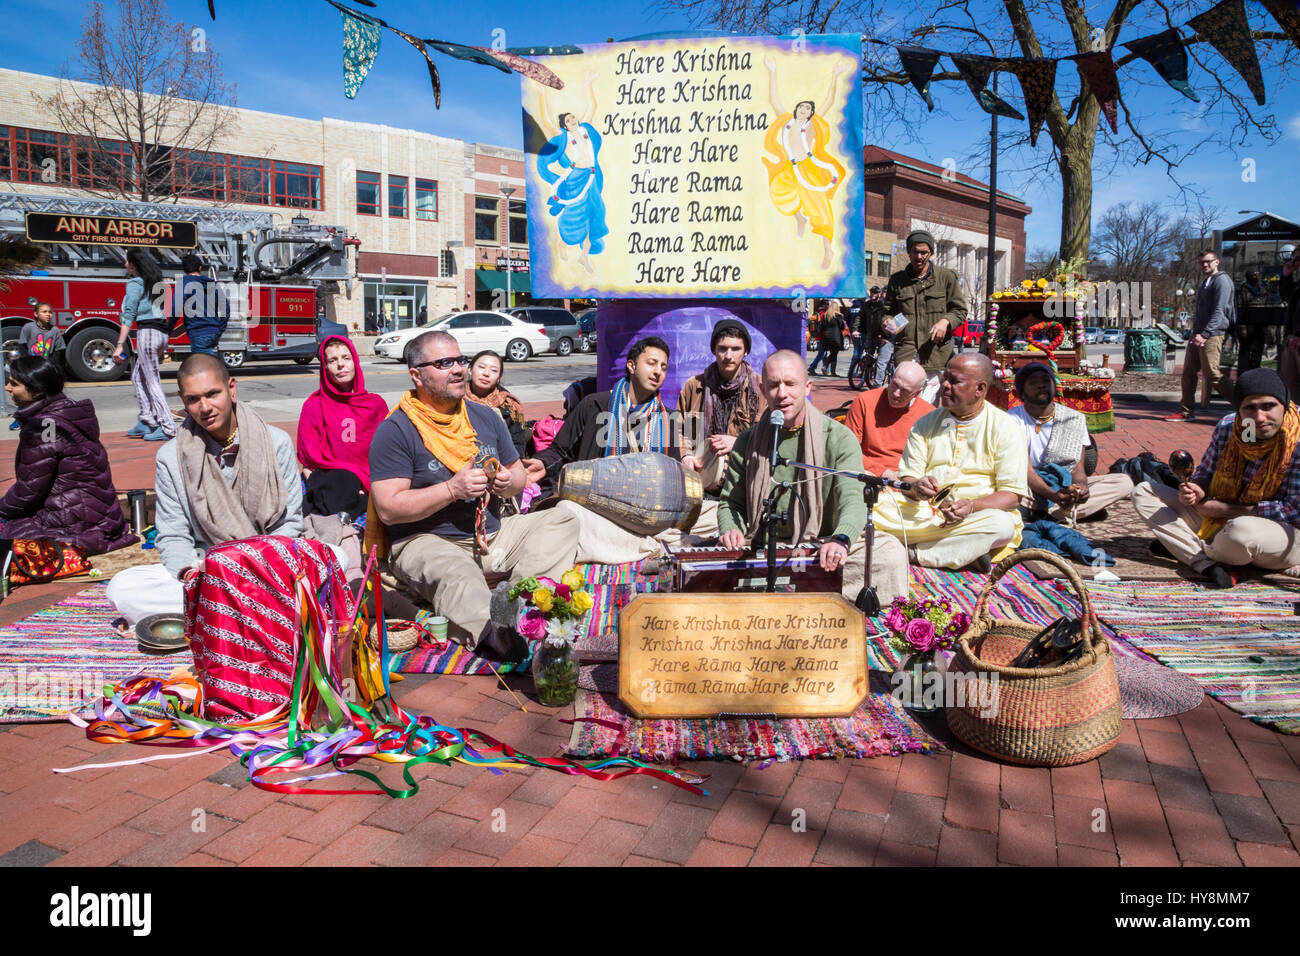 Ann Arbor, Michigan - Hare Krishna devotees chanting on the University of Michigan campus. Stock Photo